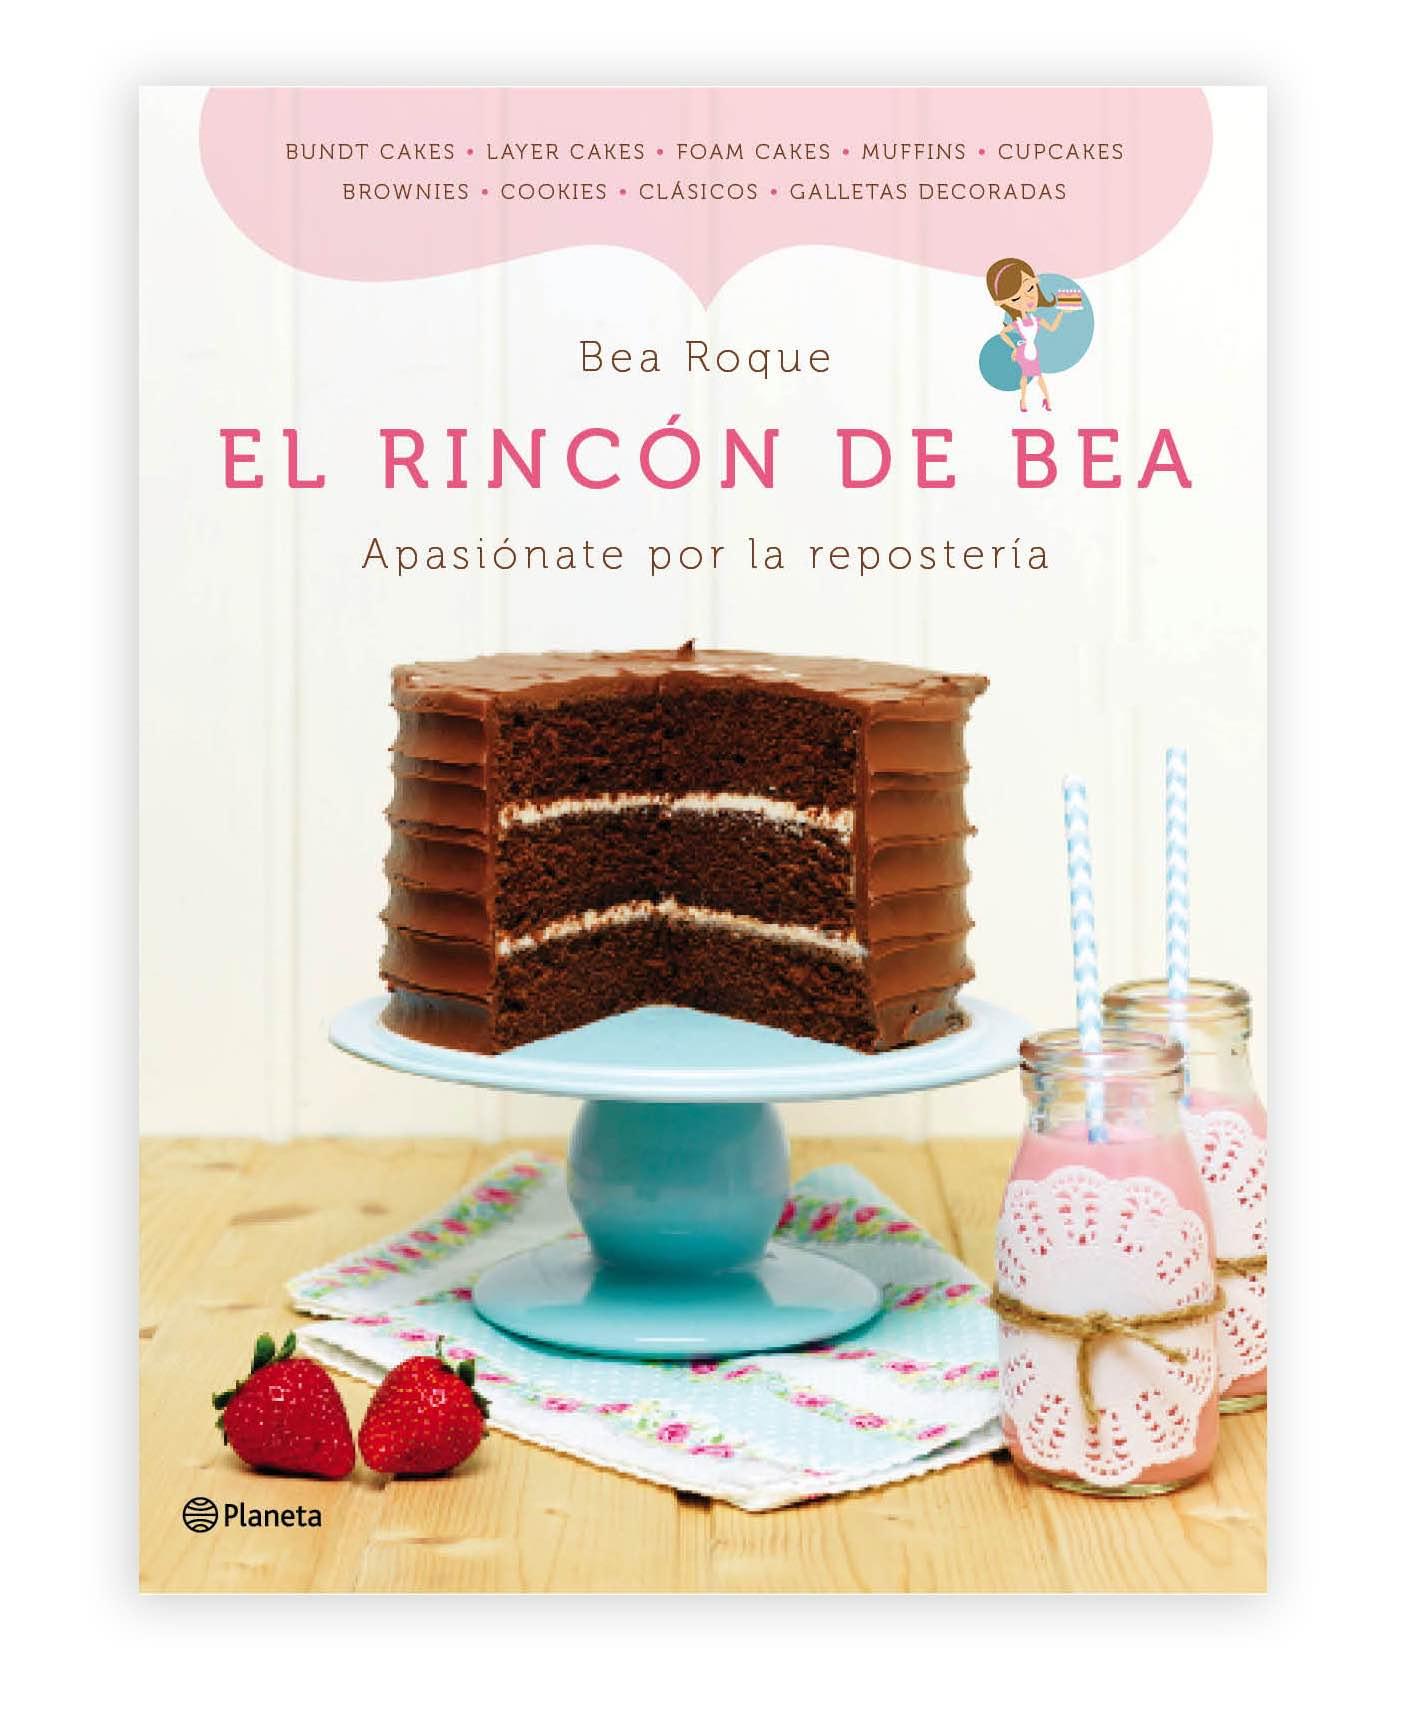 ORIGINAL TOLL HOUSE CHOCOLATE CHIP COOKIES El Rinc n de Bea